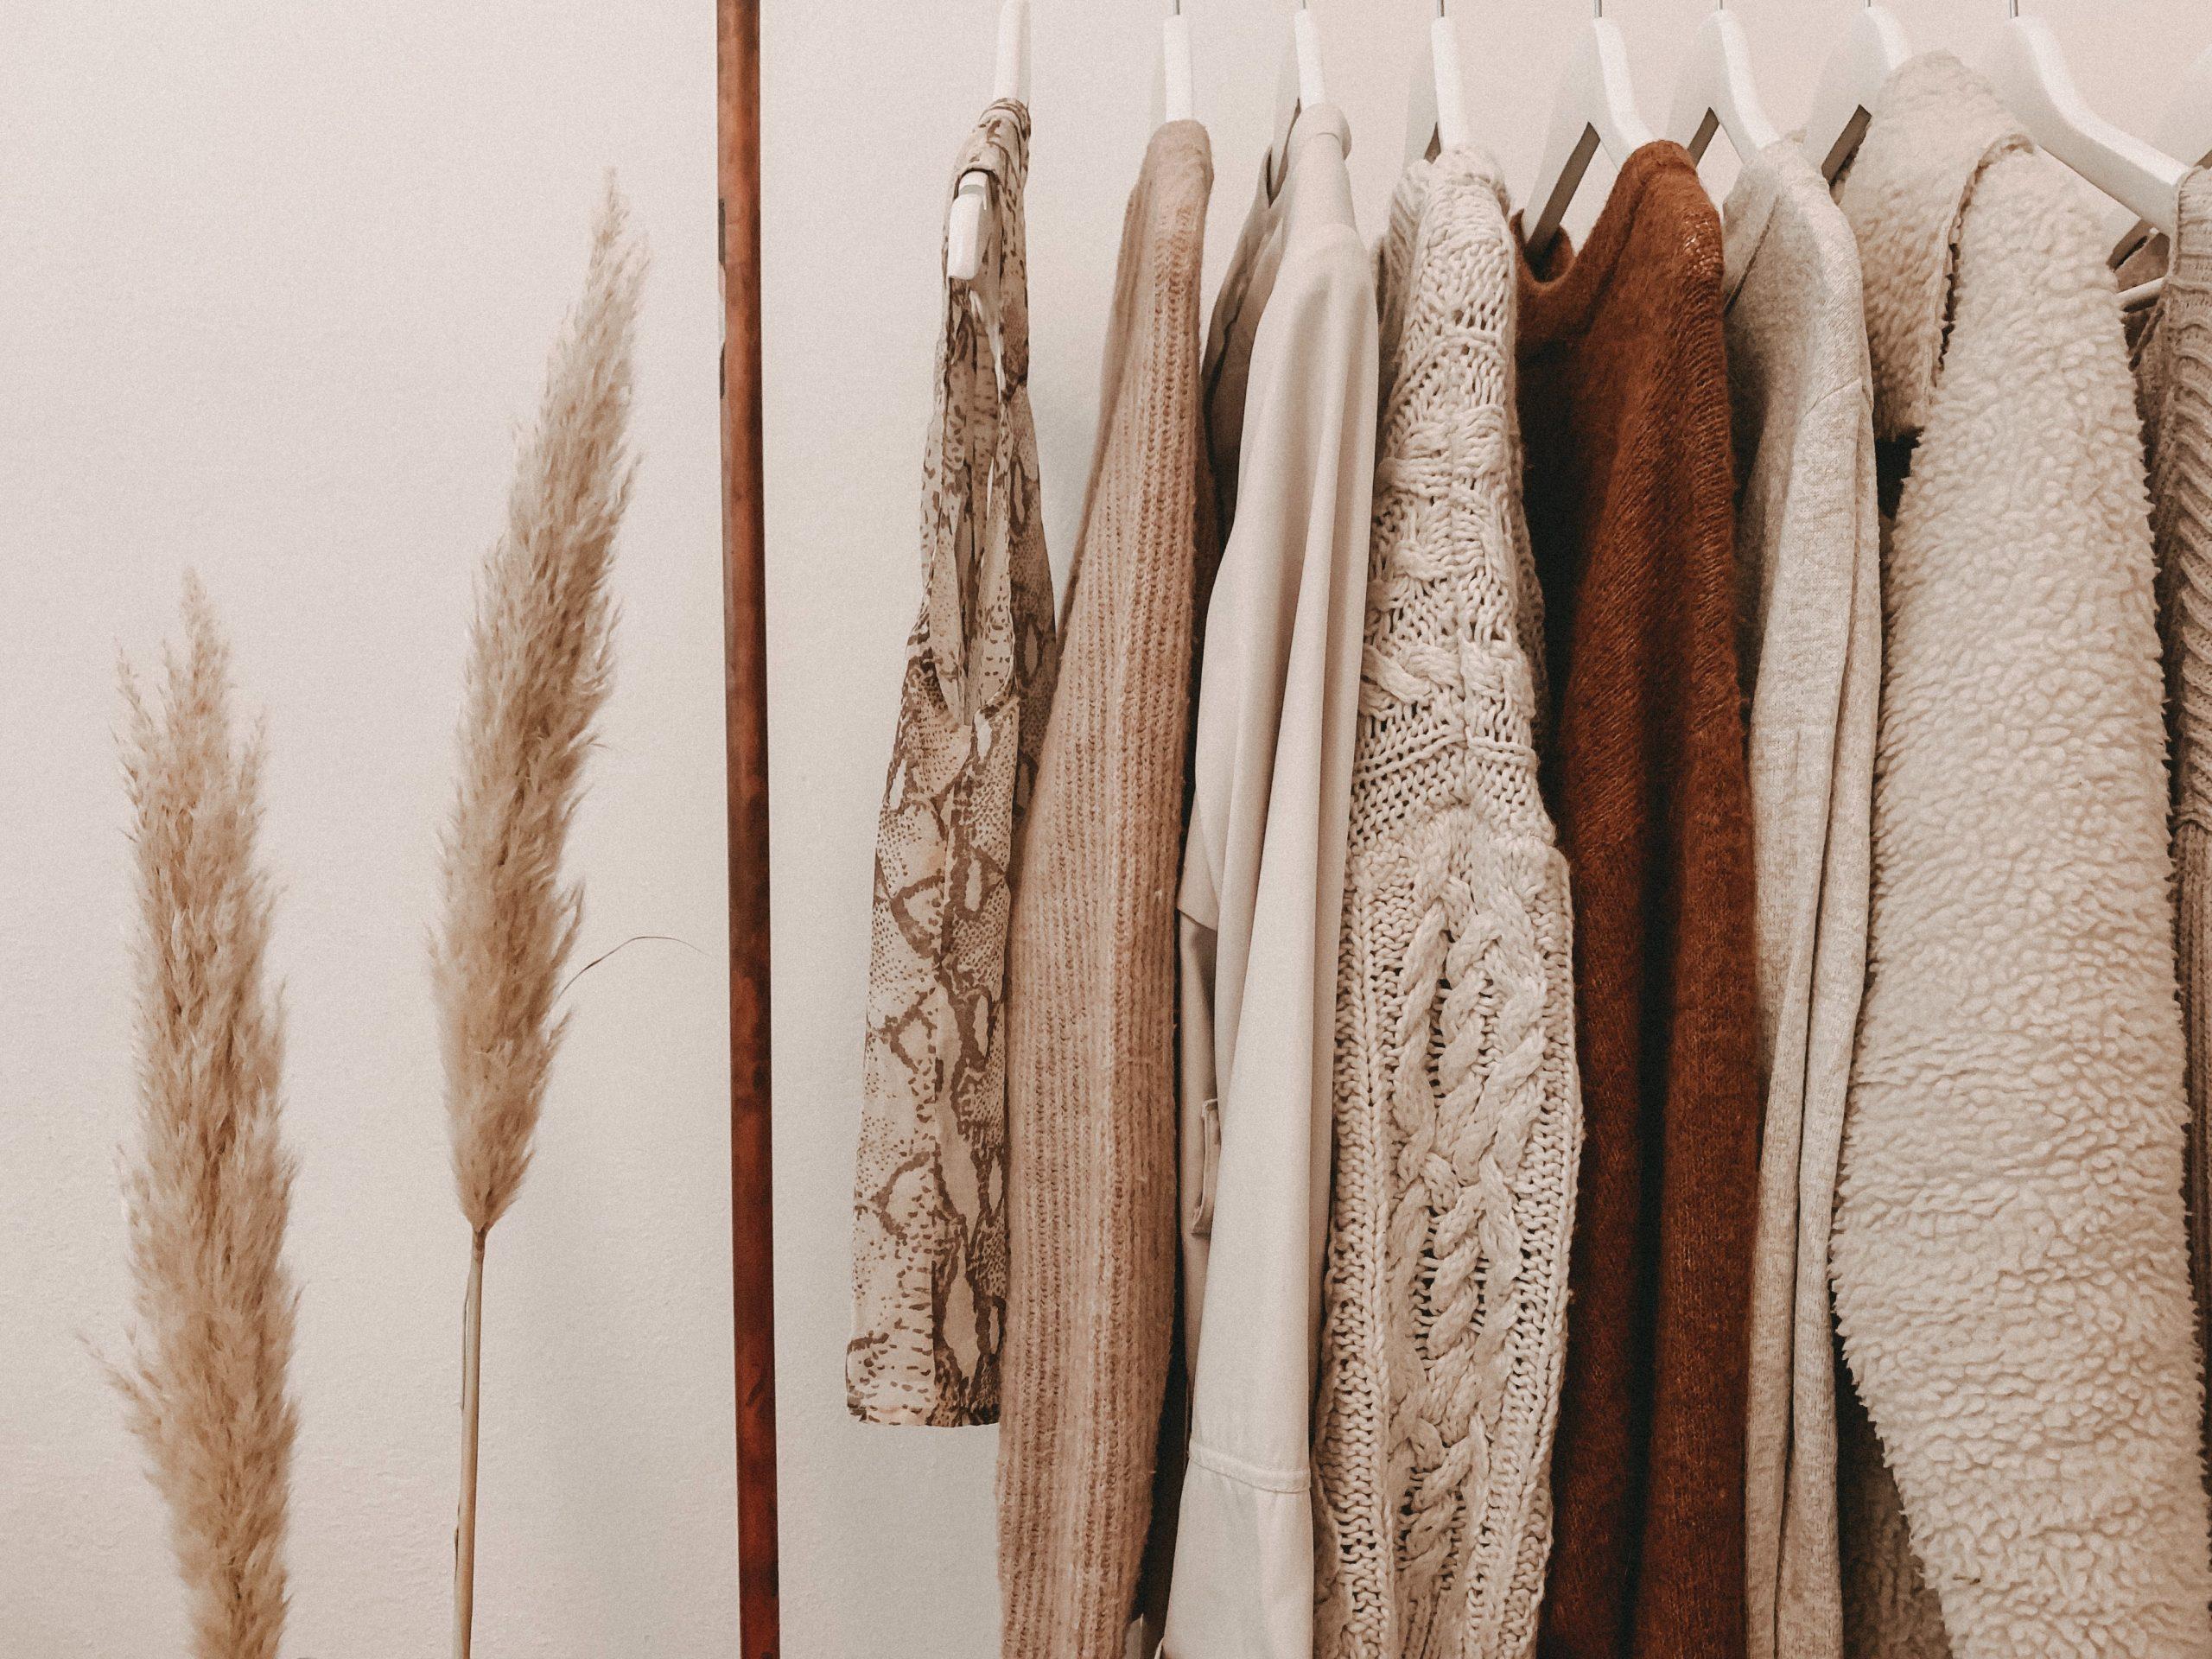 6 marcas de moda sostenible de España que deberías conocer.